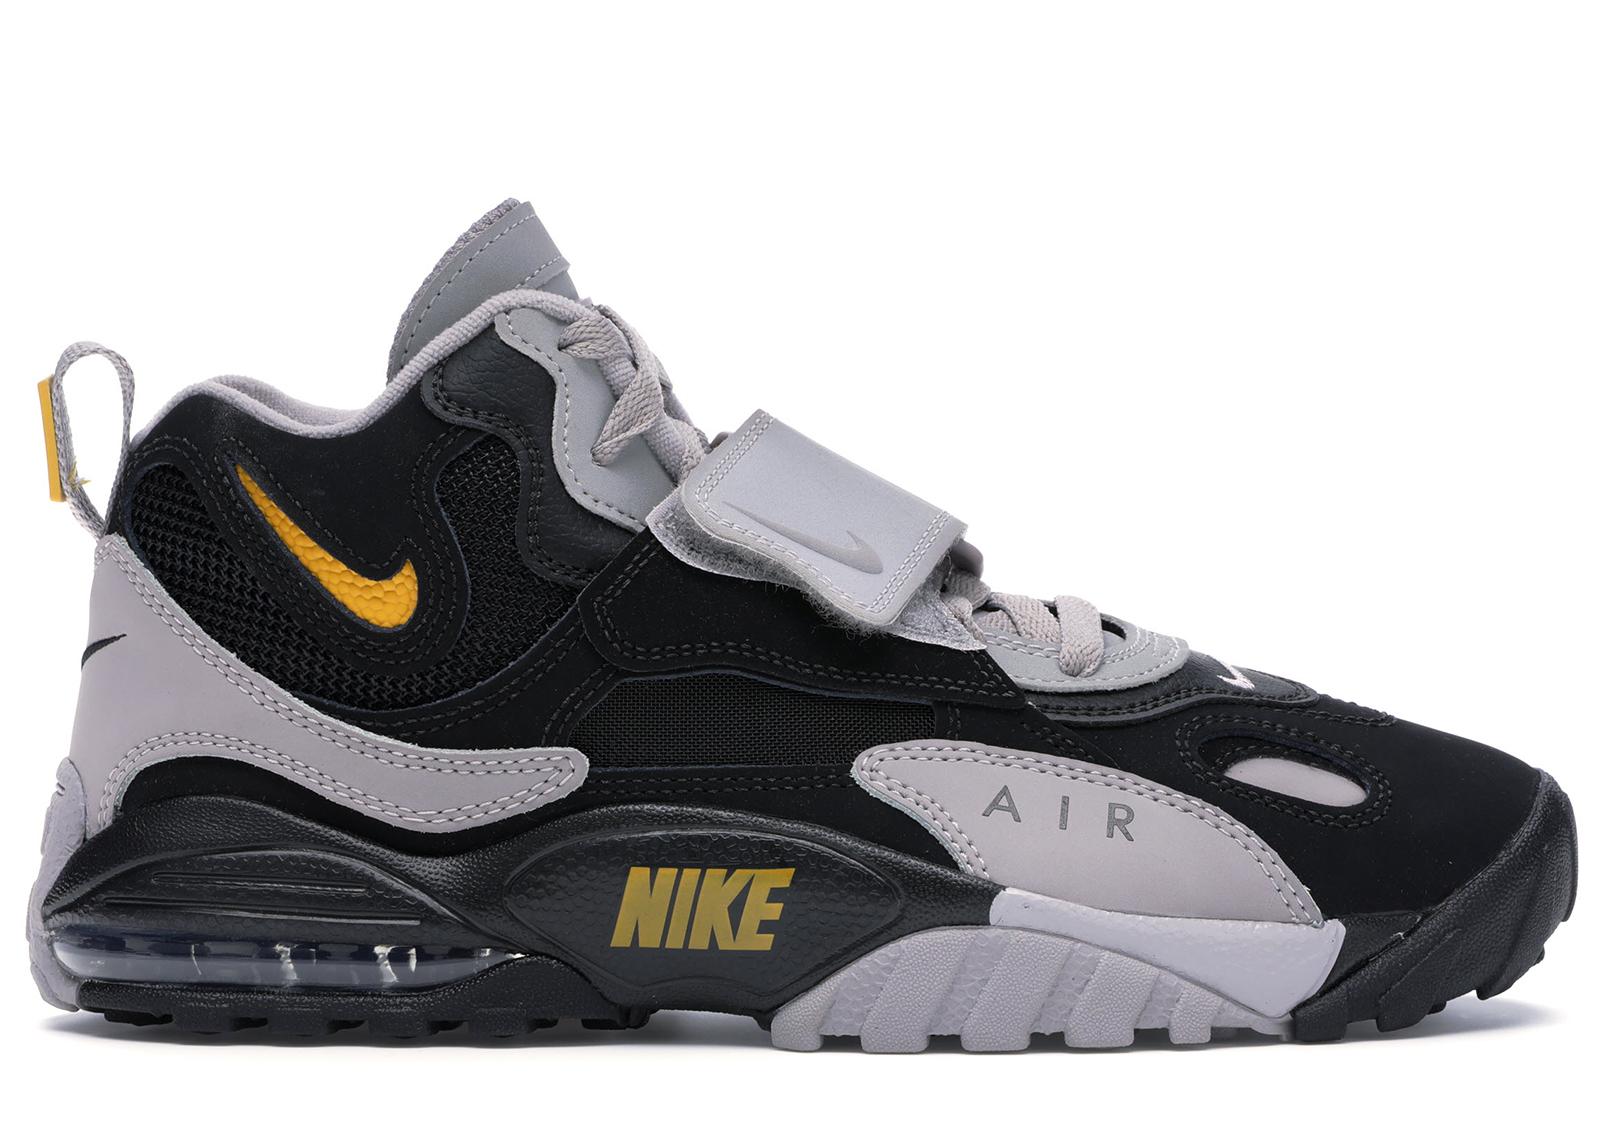 Nike Air Max Speed Turf Black Grey Yellow